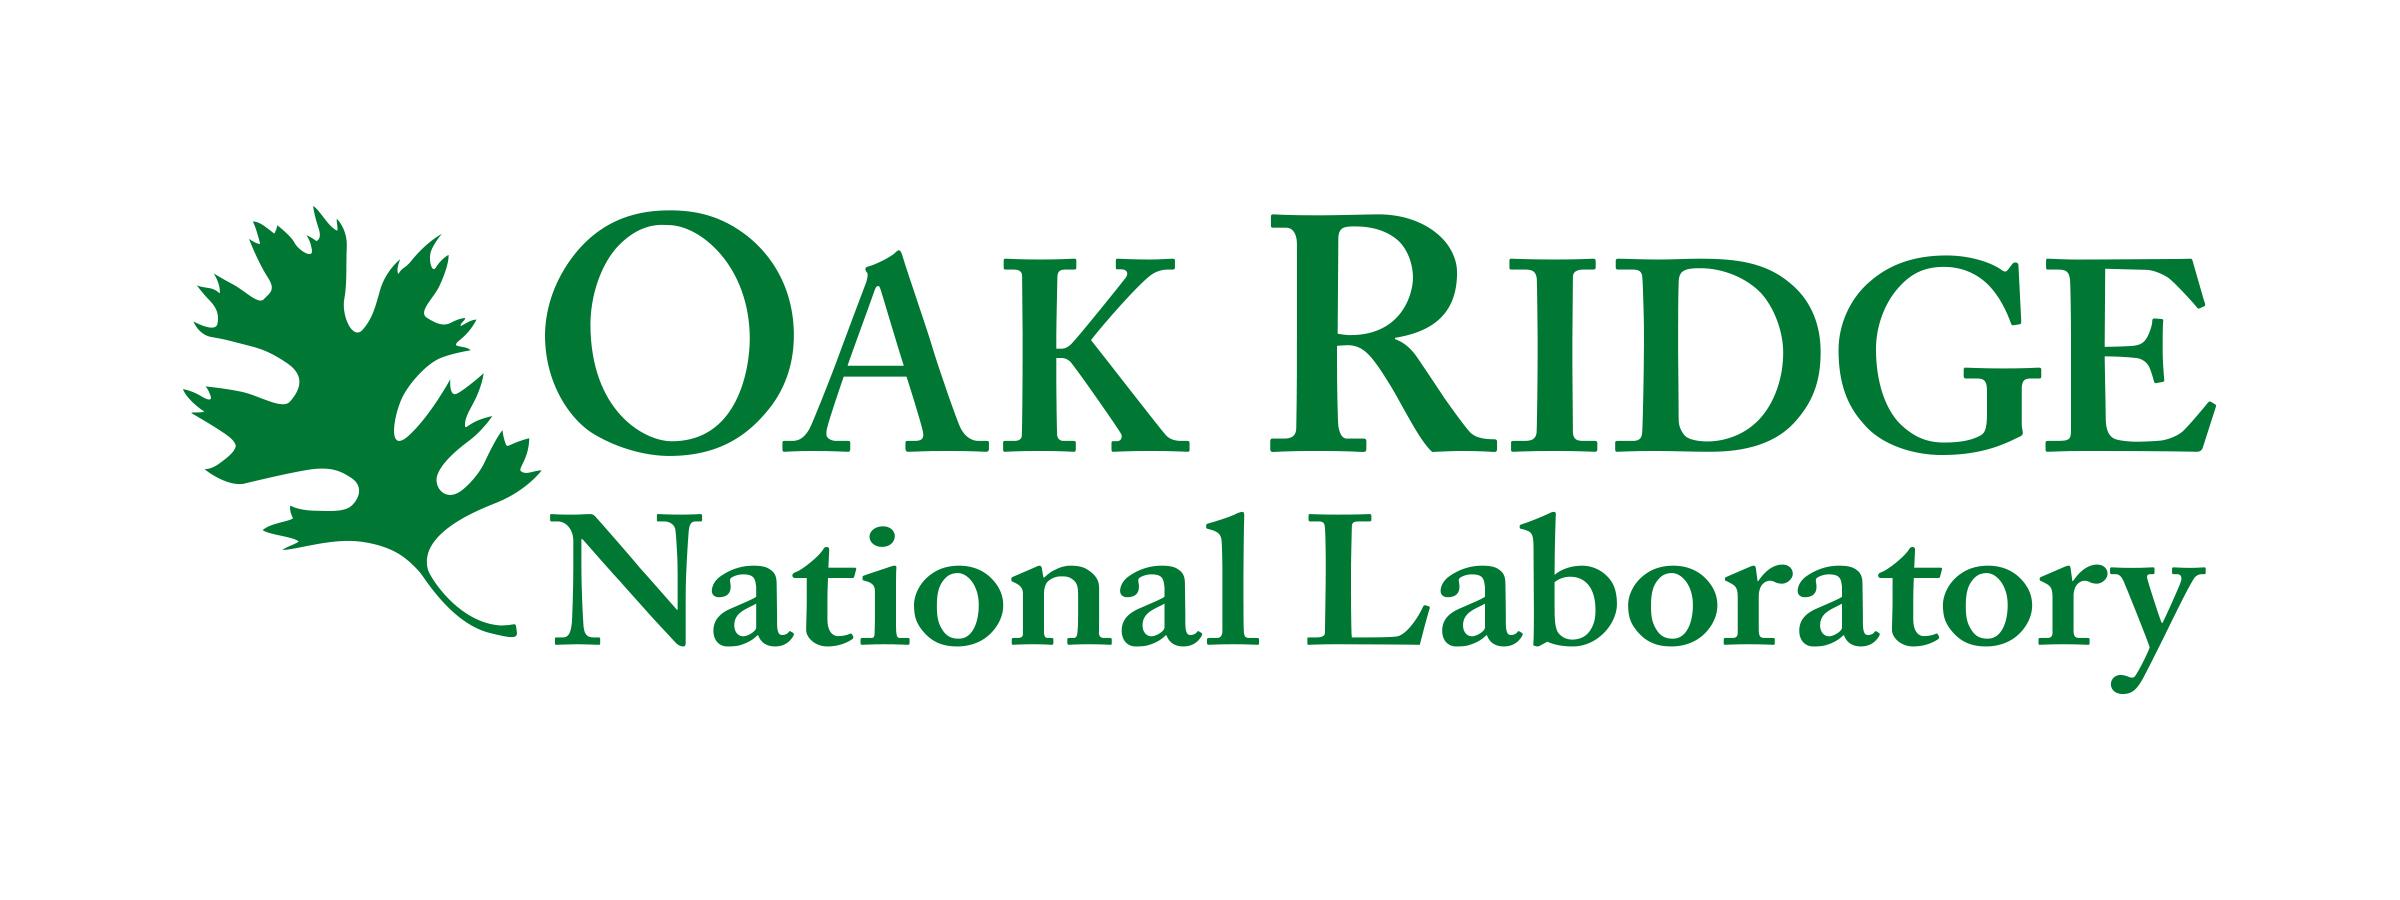 UT Battelle, Oak Ridge National Laboratory